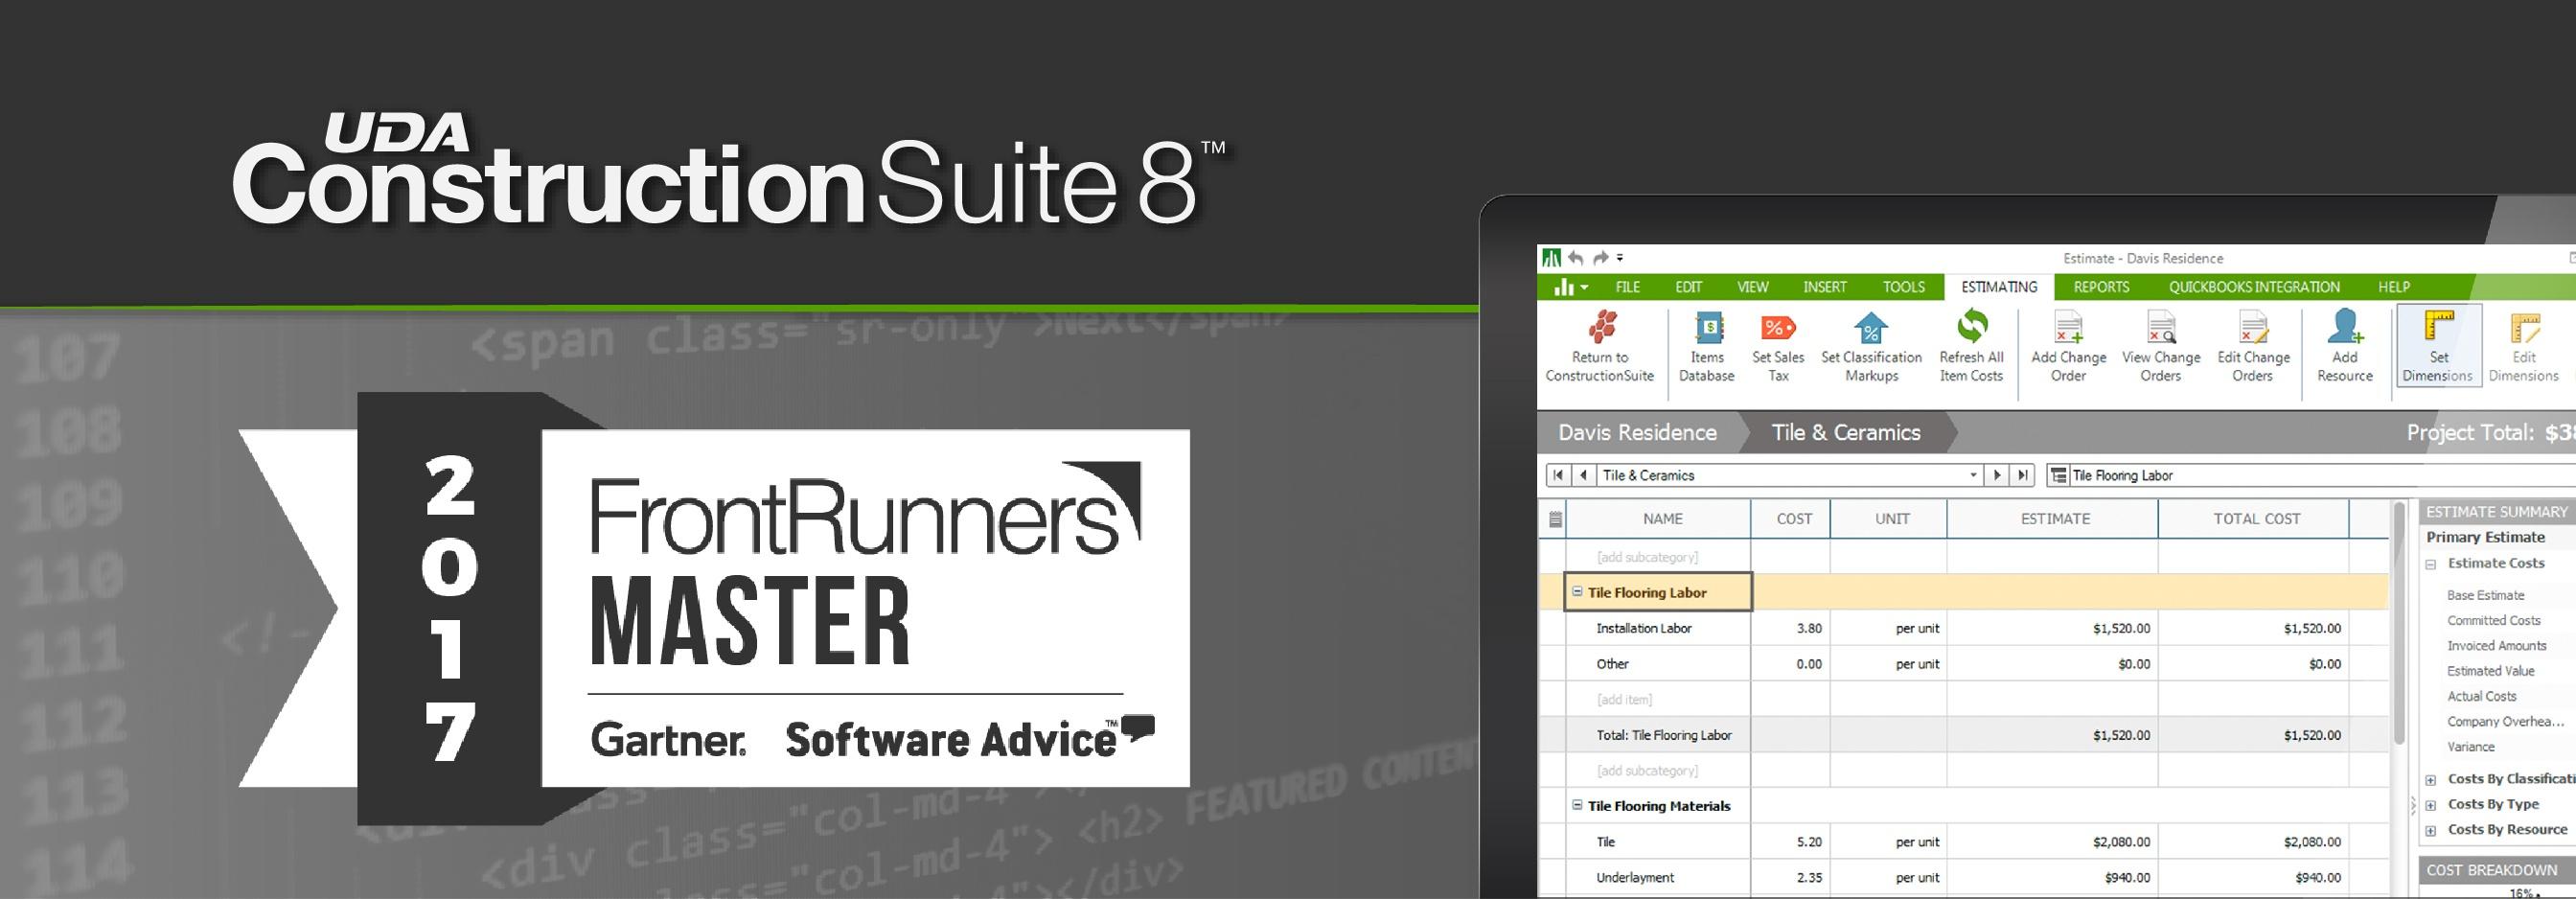 ConstructionSuite 8 Awarded 2017 FrontRunners Master Designation